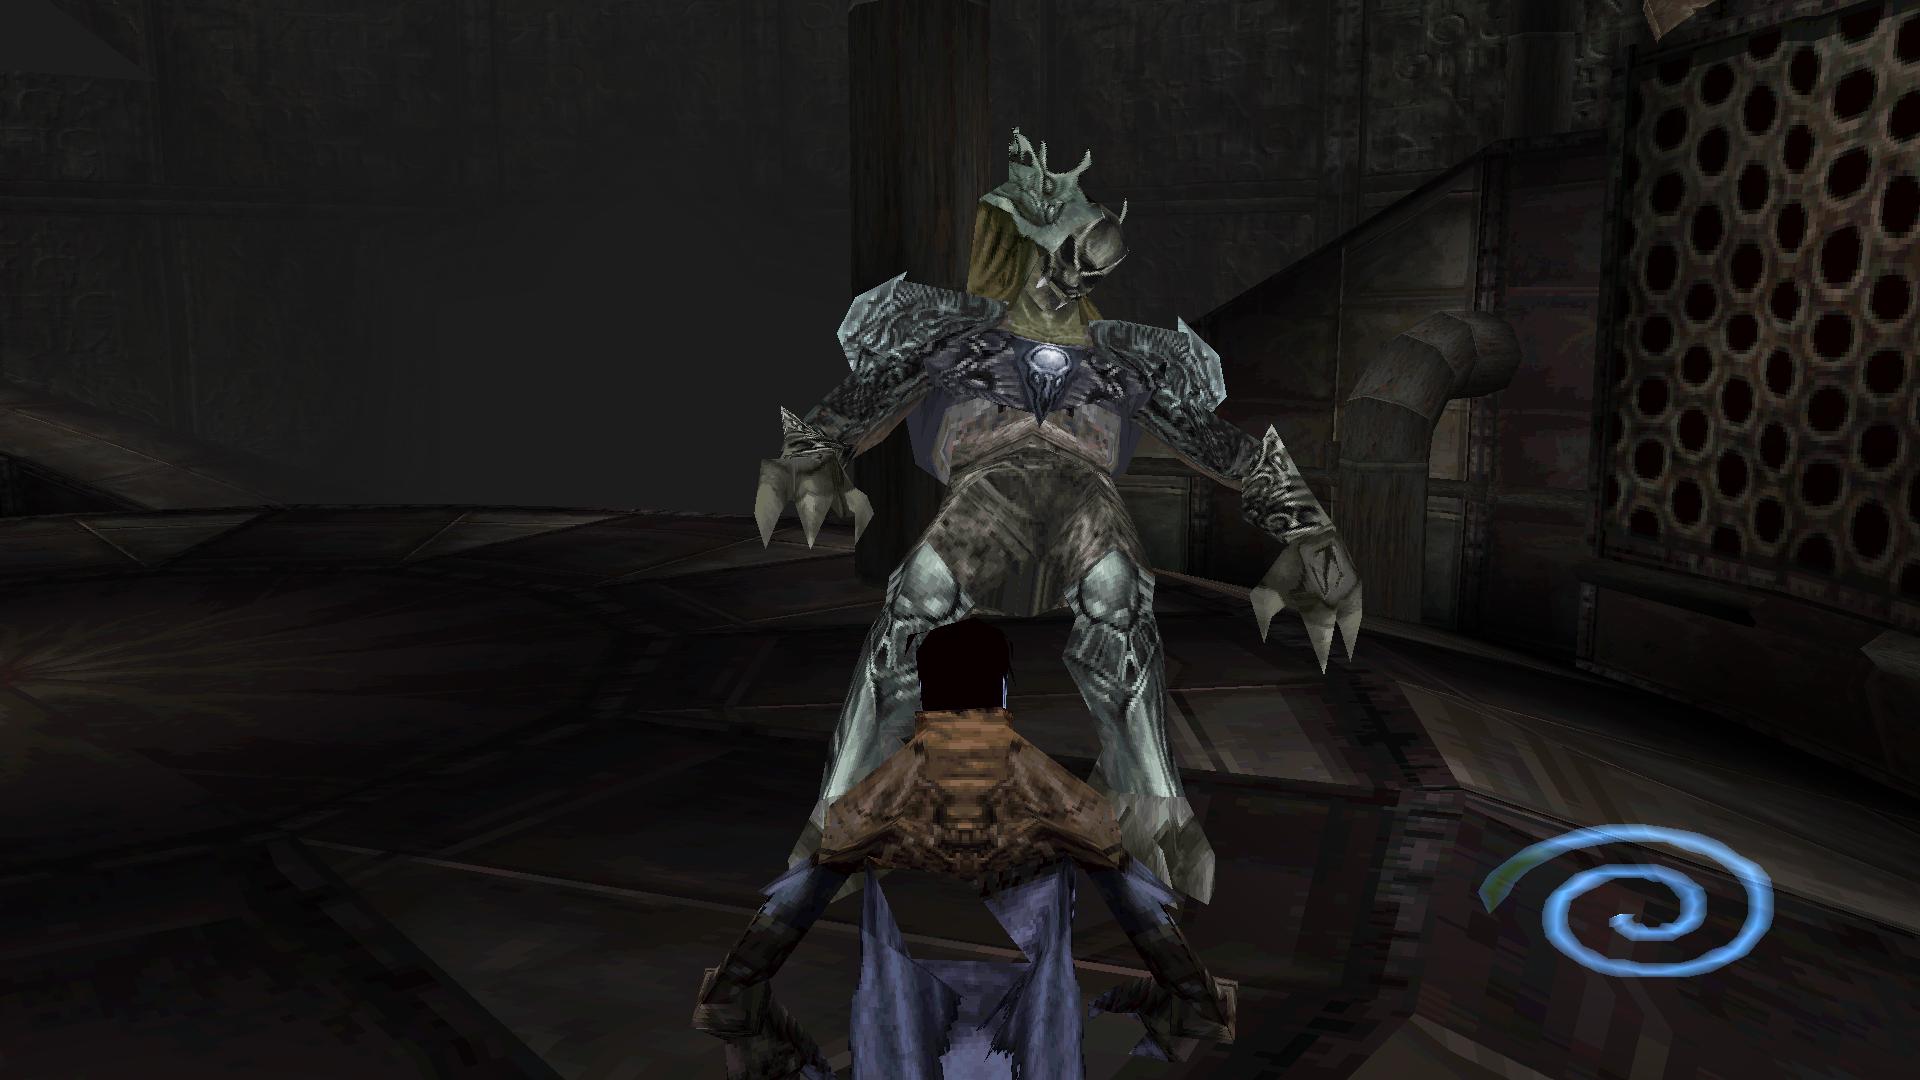 Dumah (Soul Reaver boss)